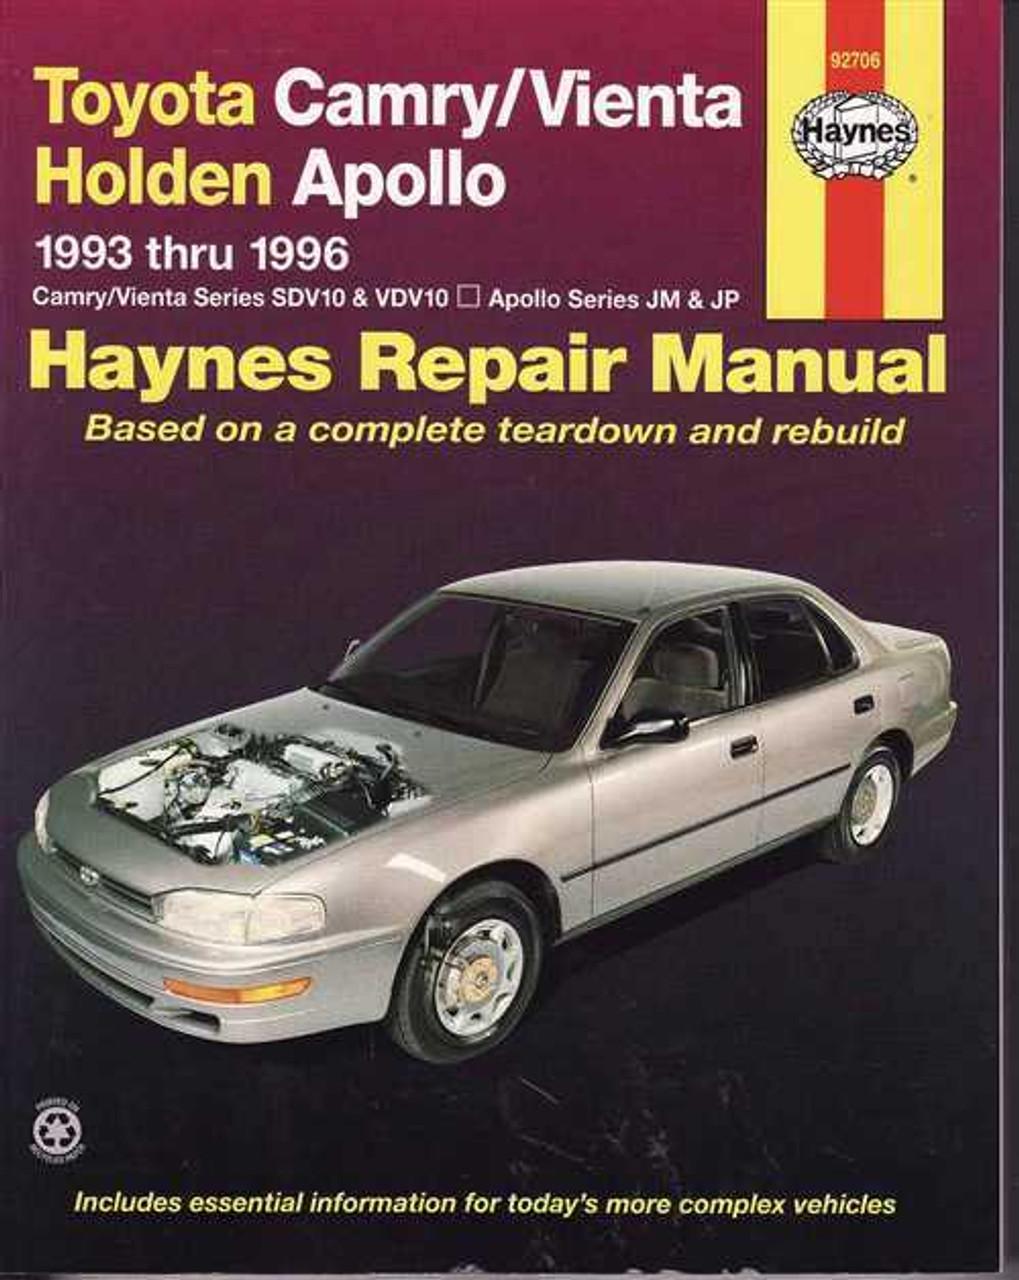 Opel Zafira Wiring Diagram On Haynes Repair Manuals Wiring Diagrams